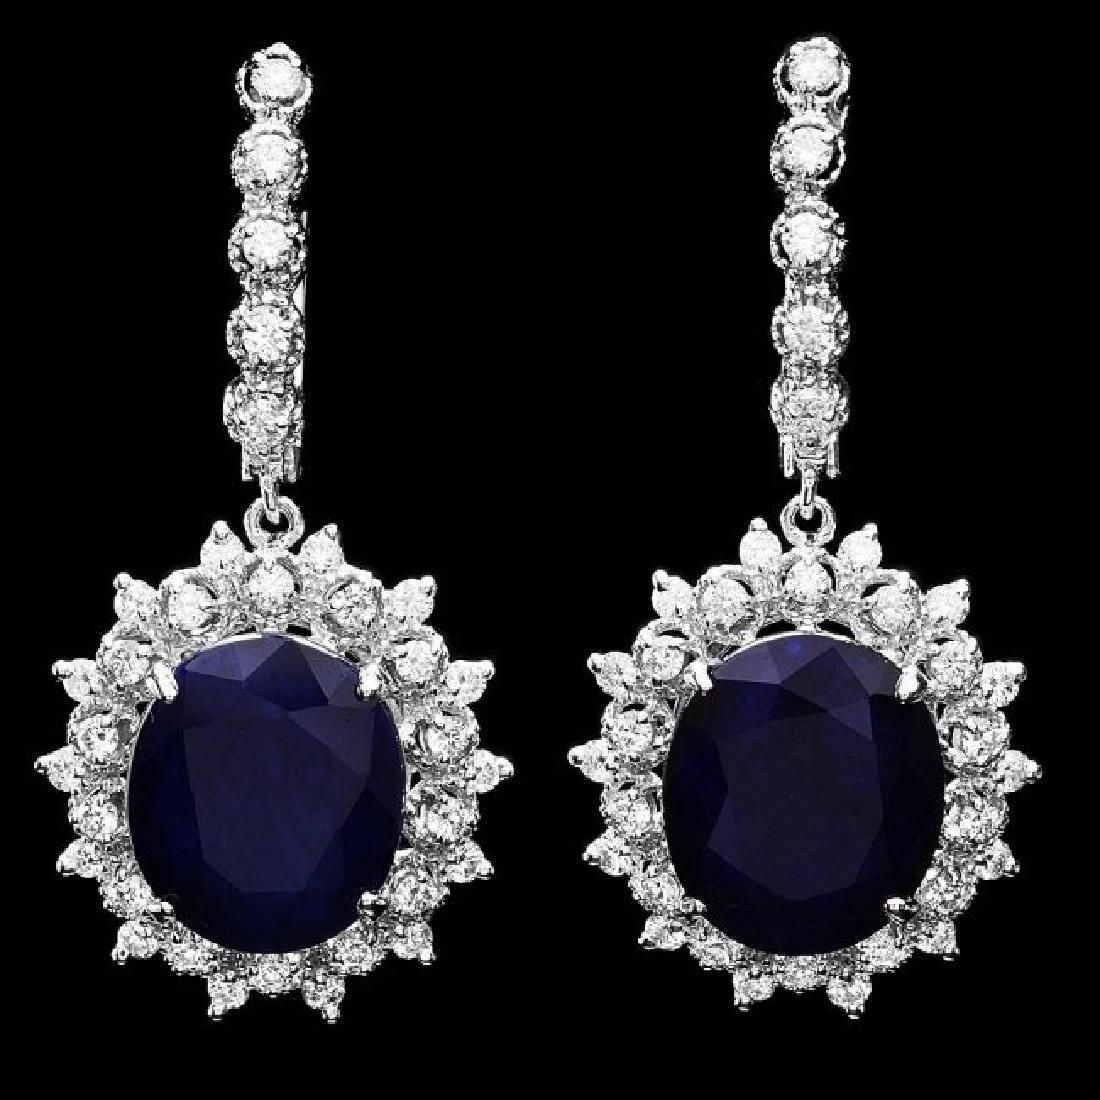 14k Gold 15ct Sapphire 1.50ct Diamond Earrings